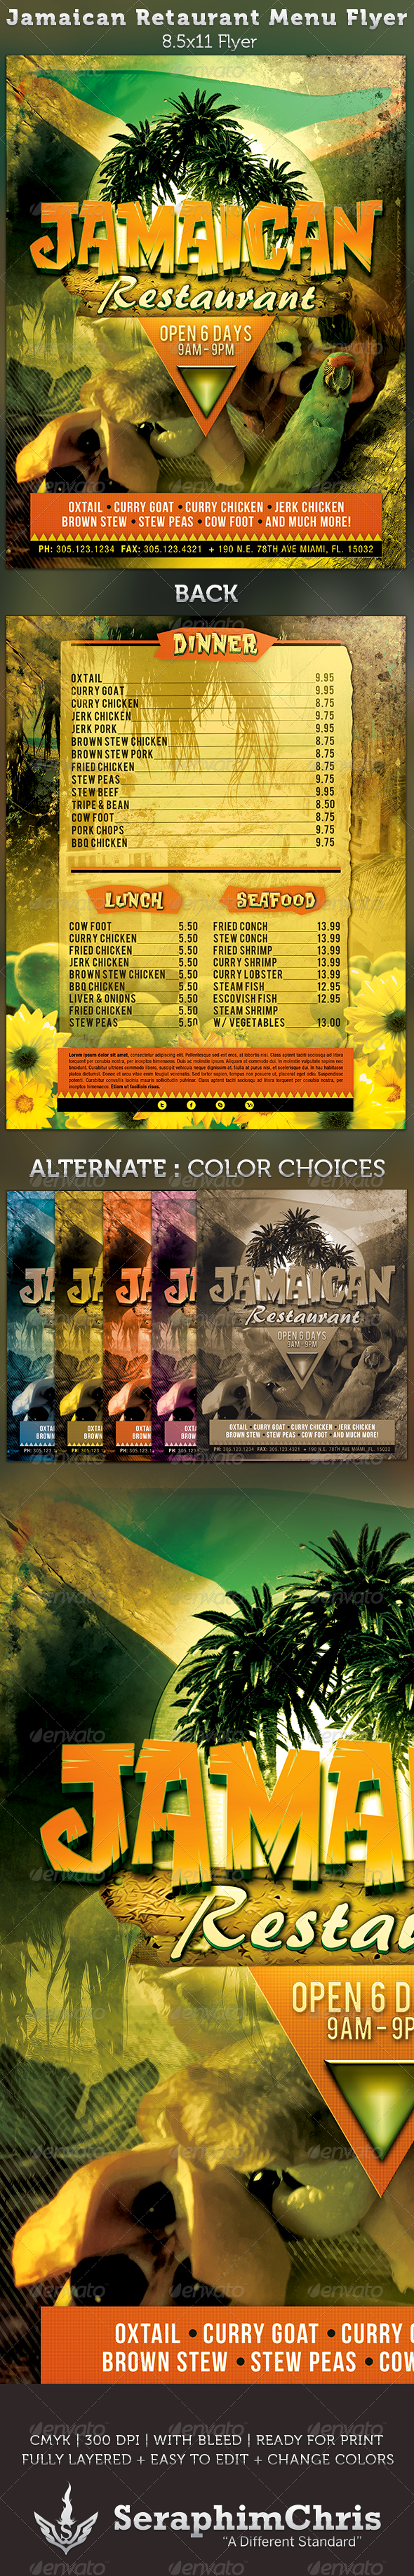 GraphicRiver Jamaican Restaurant Menu Flyer Template 3292284